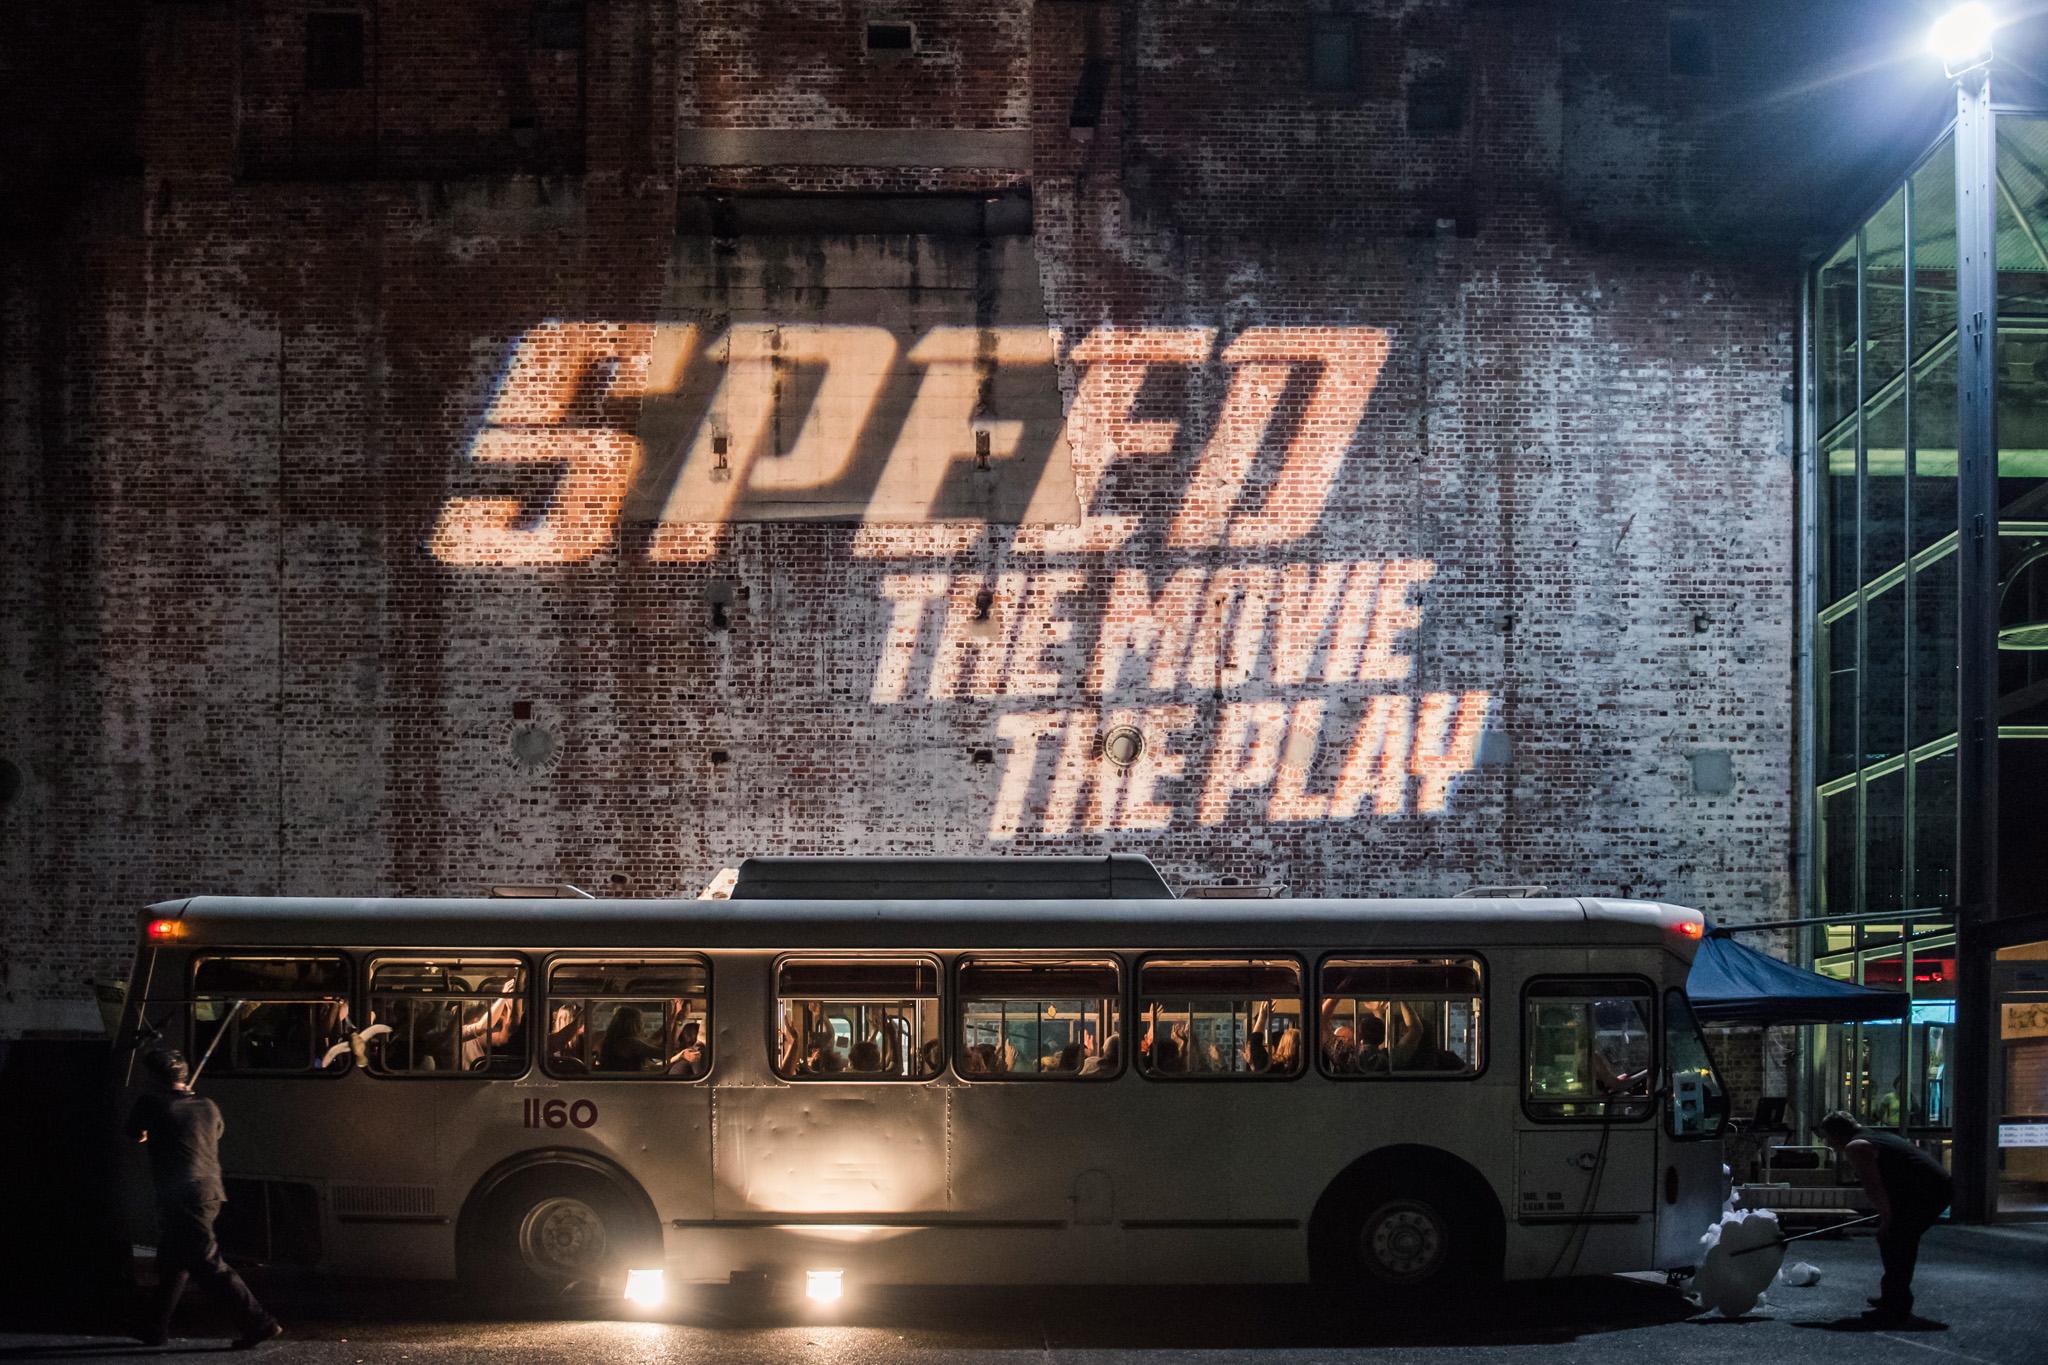 Speed-the-movie-the-play-20 (1).jpg